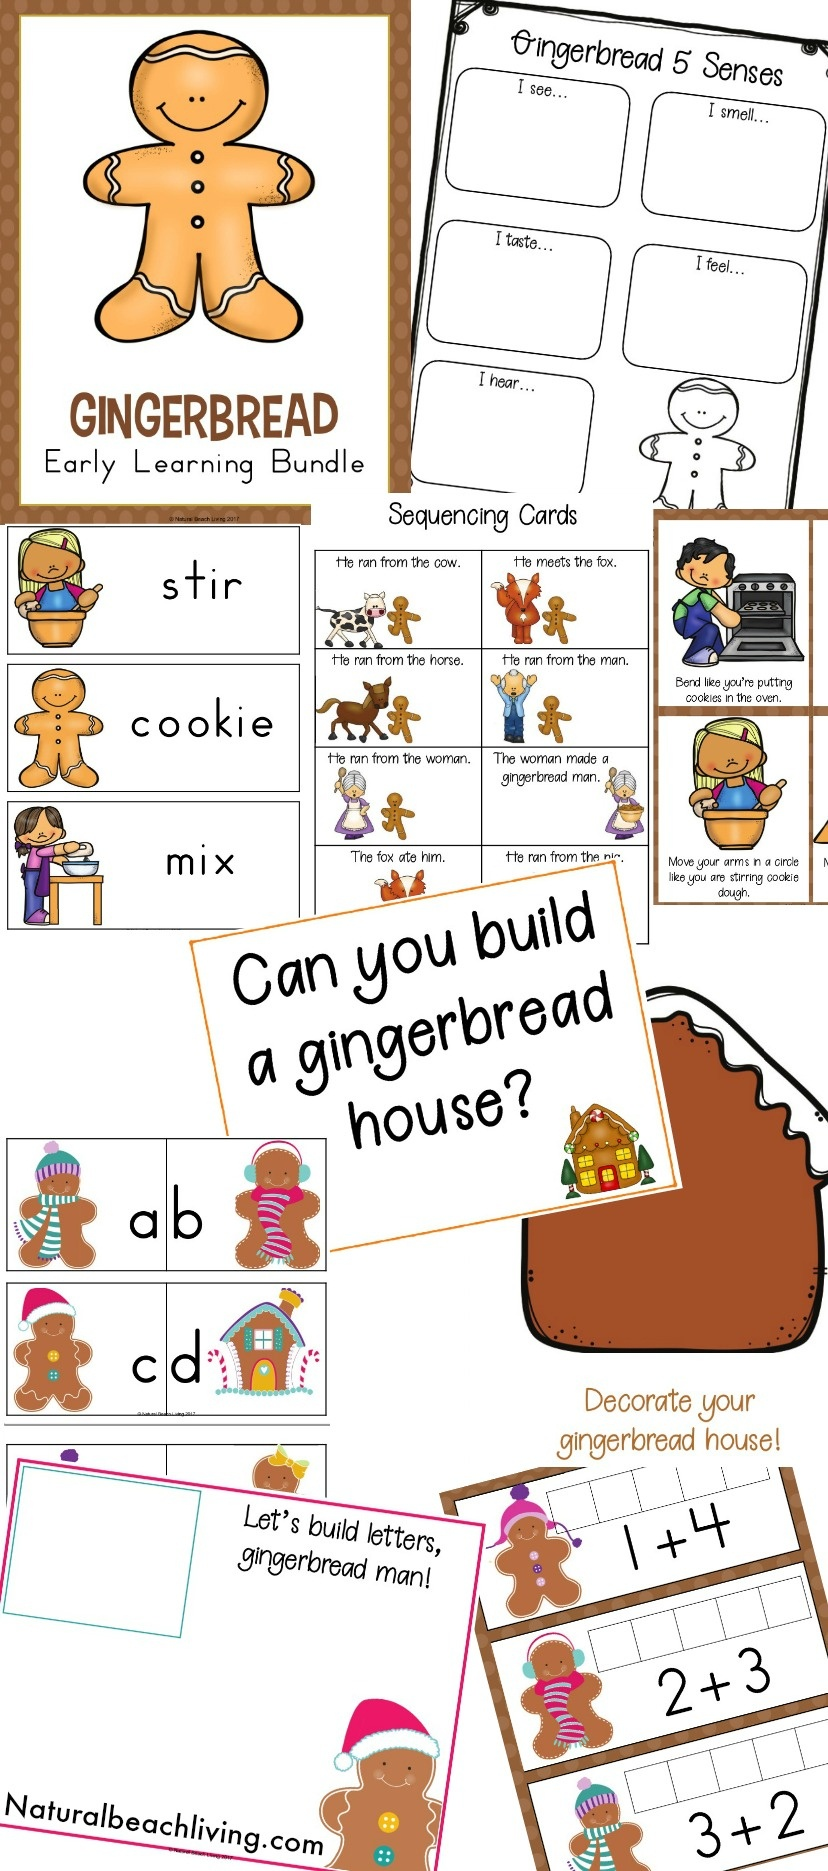 Gingerbread Man Preschool Emotions Printables - Natural Beach Living - Free Printable Gingerbread Man Activities